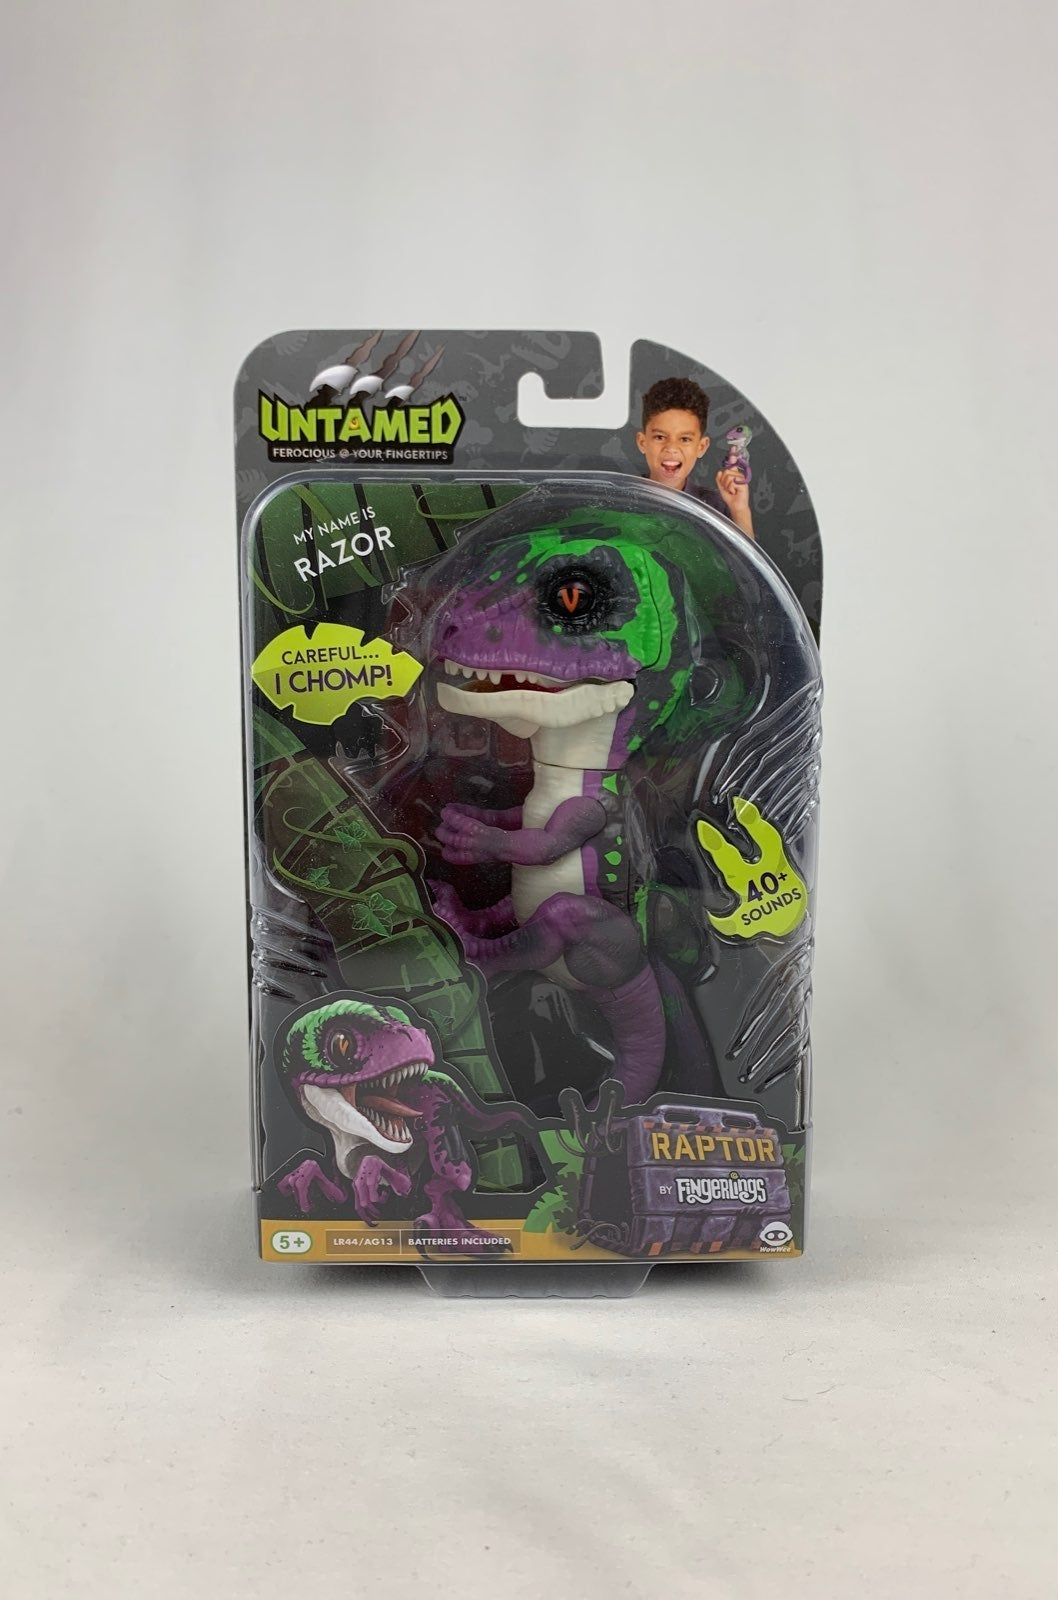 WowWee Untamed Raptor - Razor